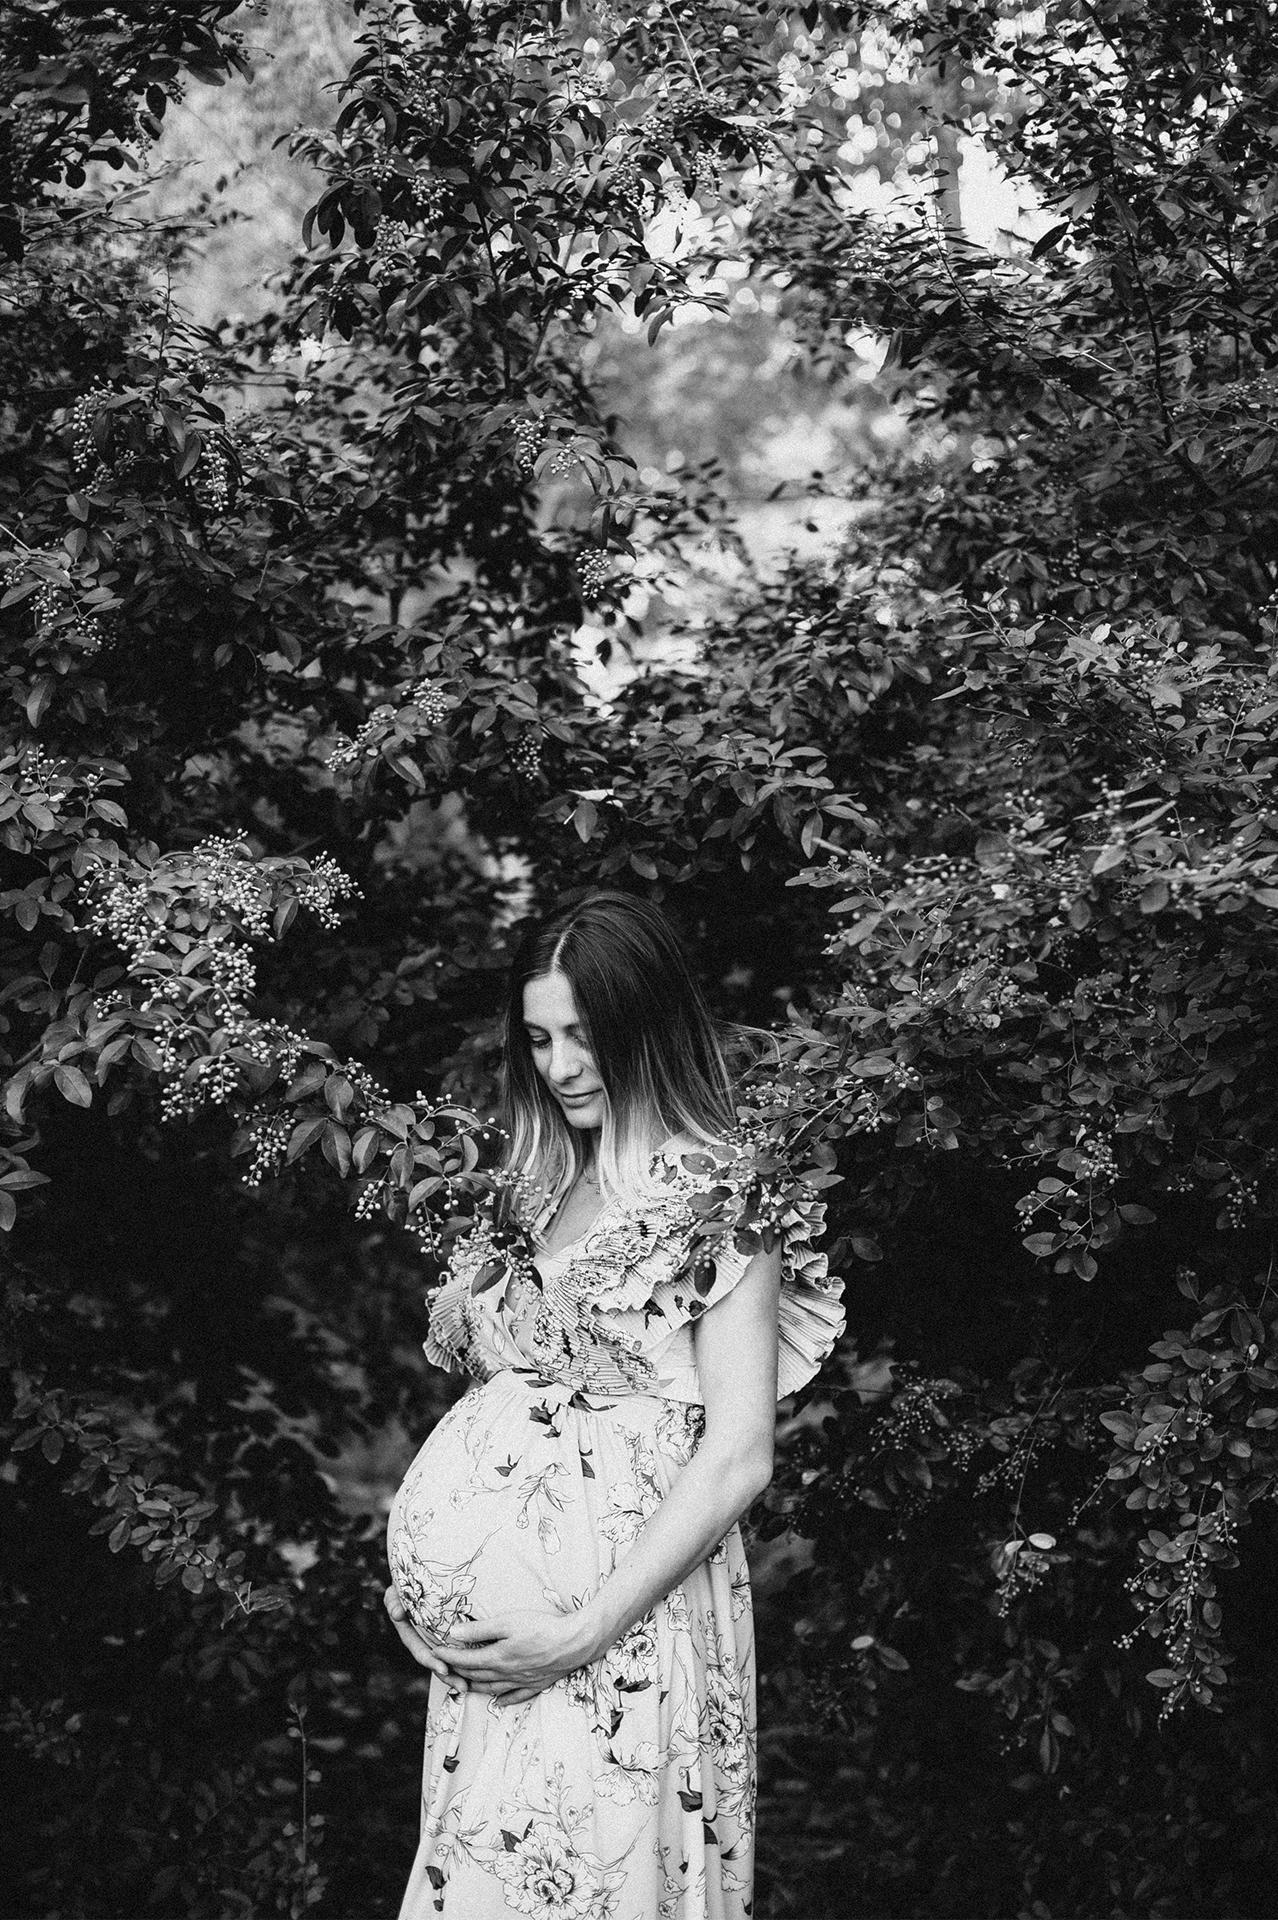 donna incinta tra gli ulivi